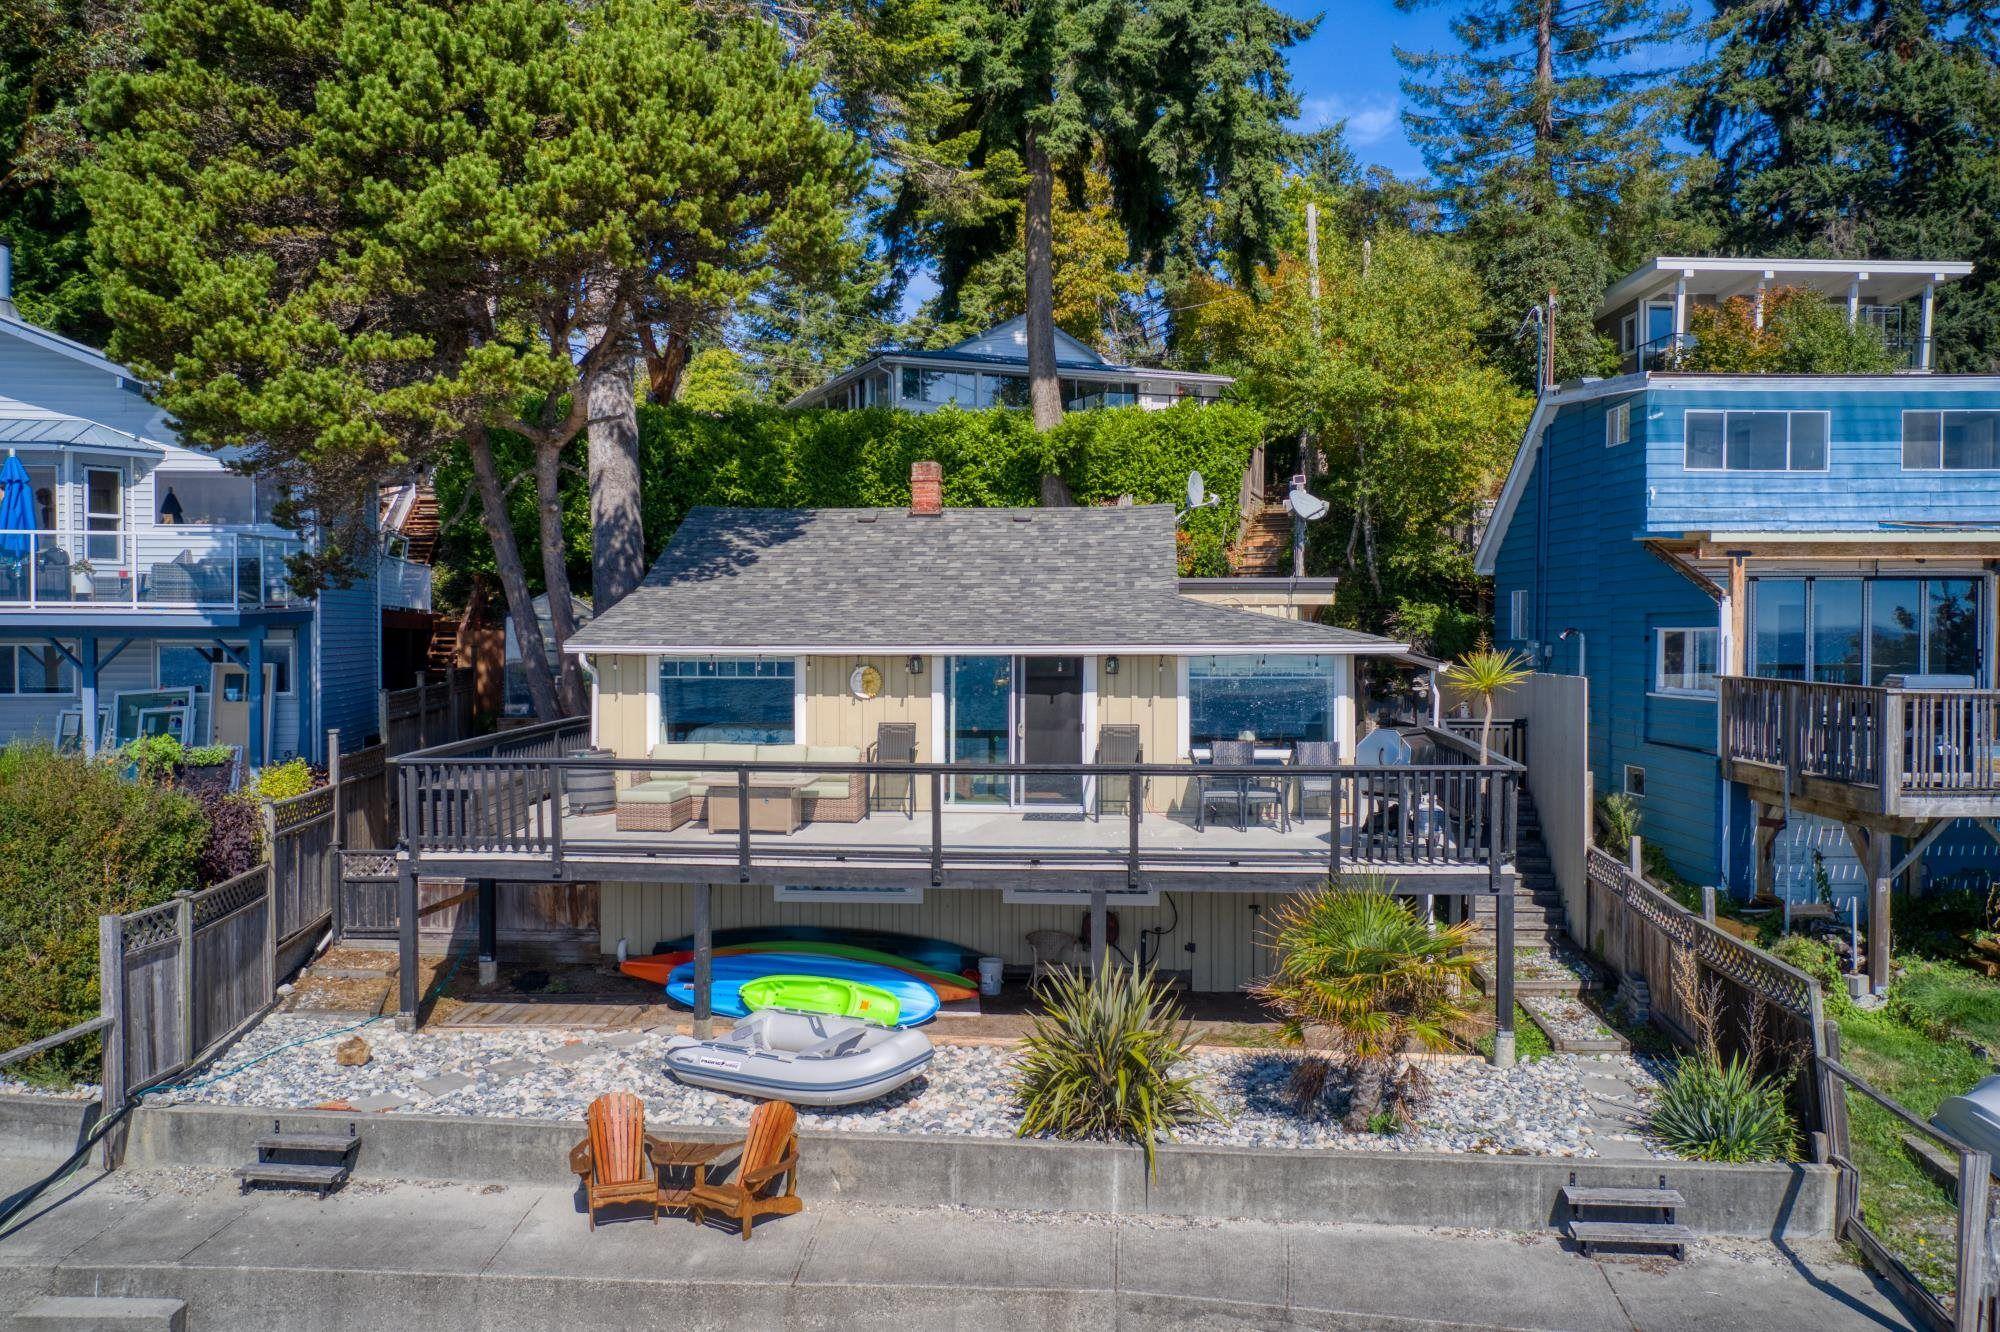 Main Photo: 5413 SELMA PARK Road in Sechelt: Sechelt District House for sale (Sunshine Coast)  : MLS®# R2618283